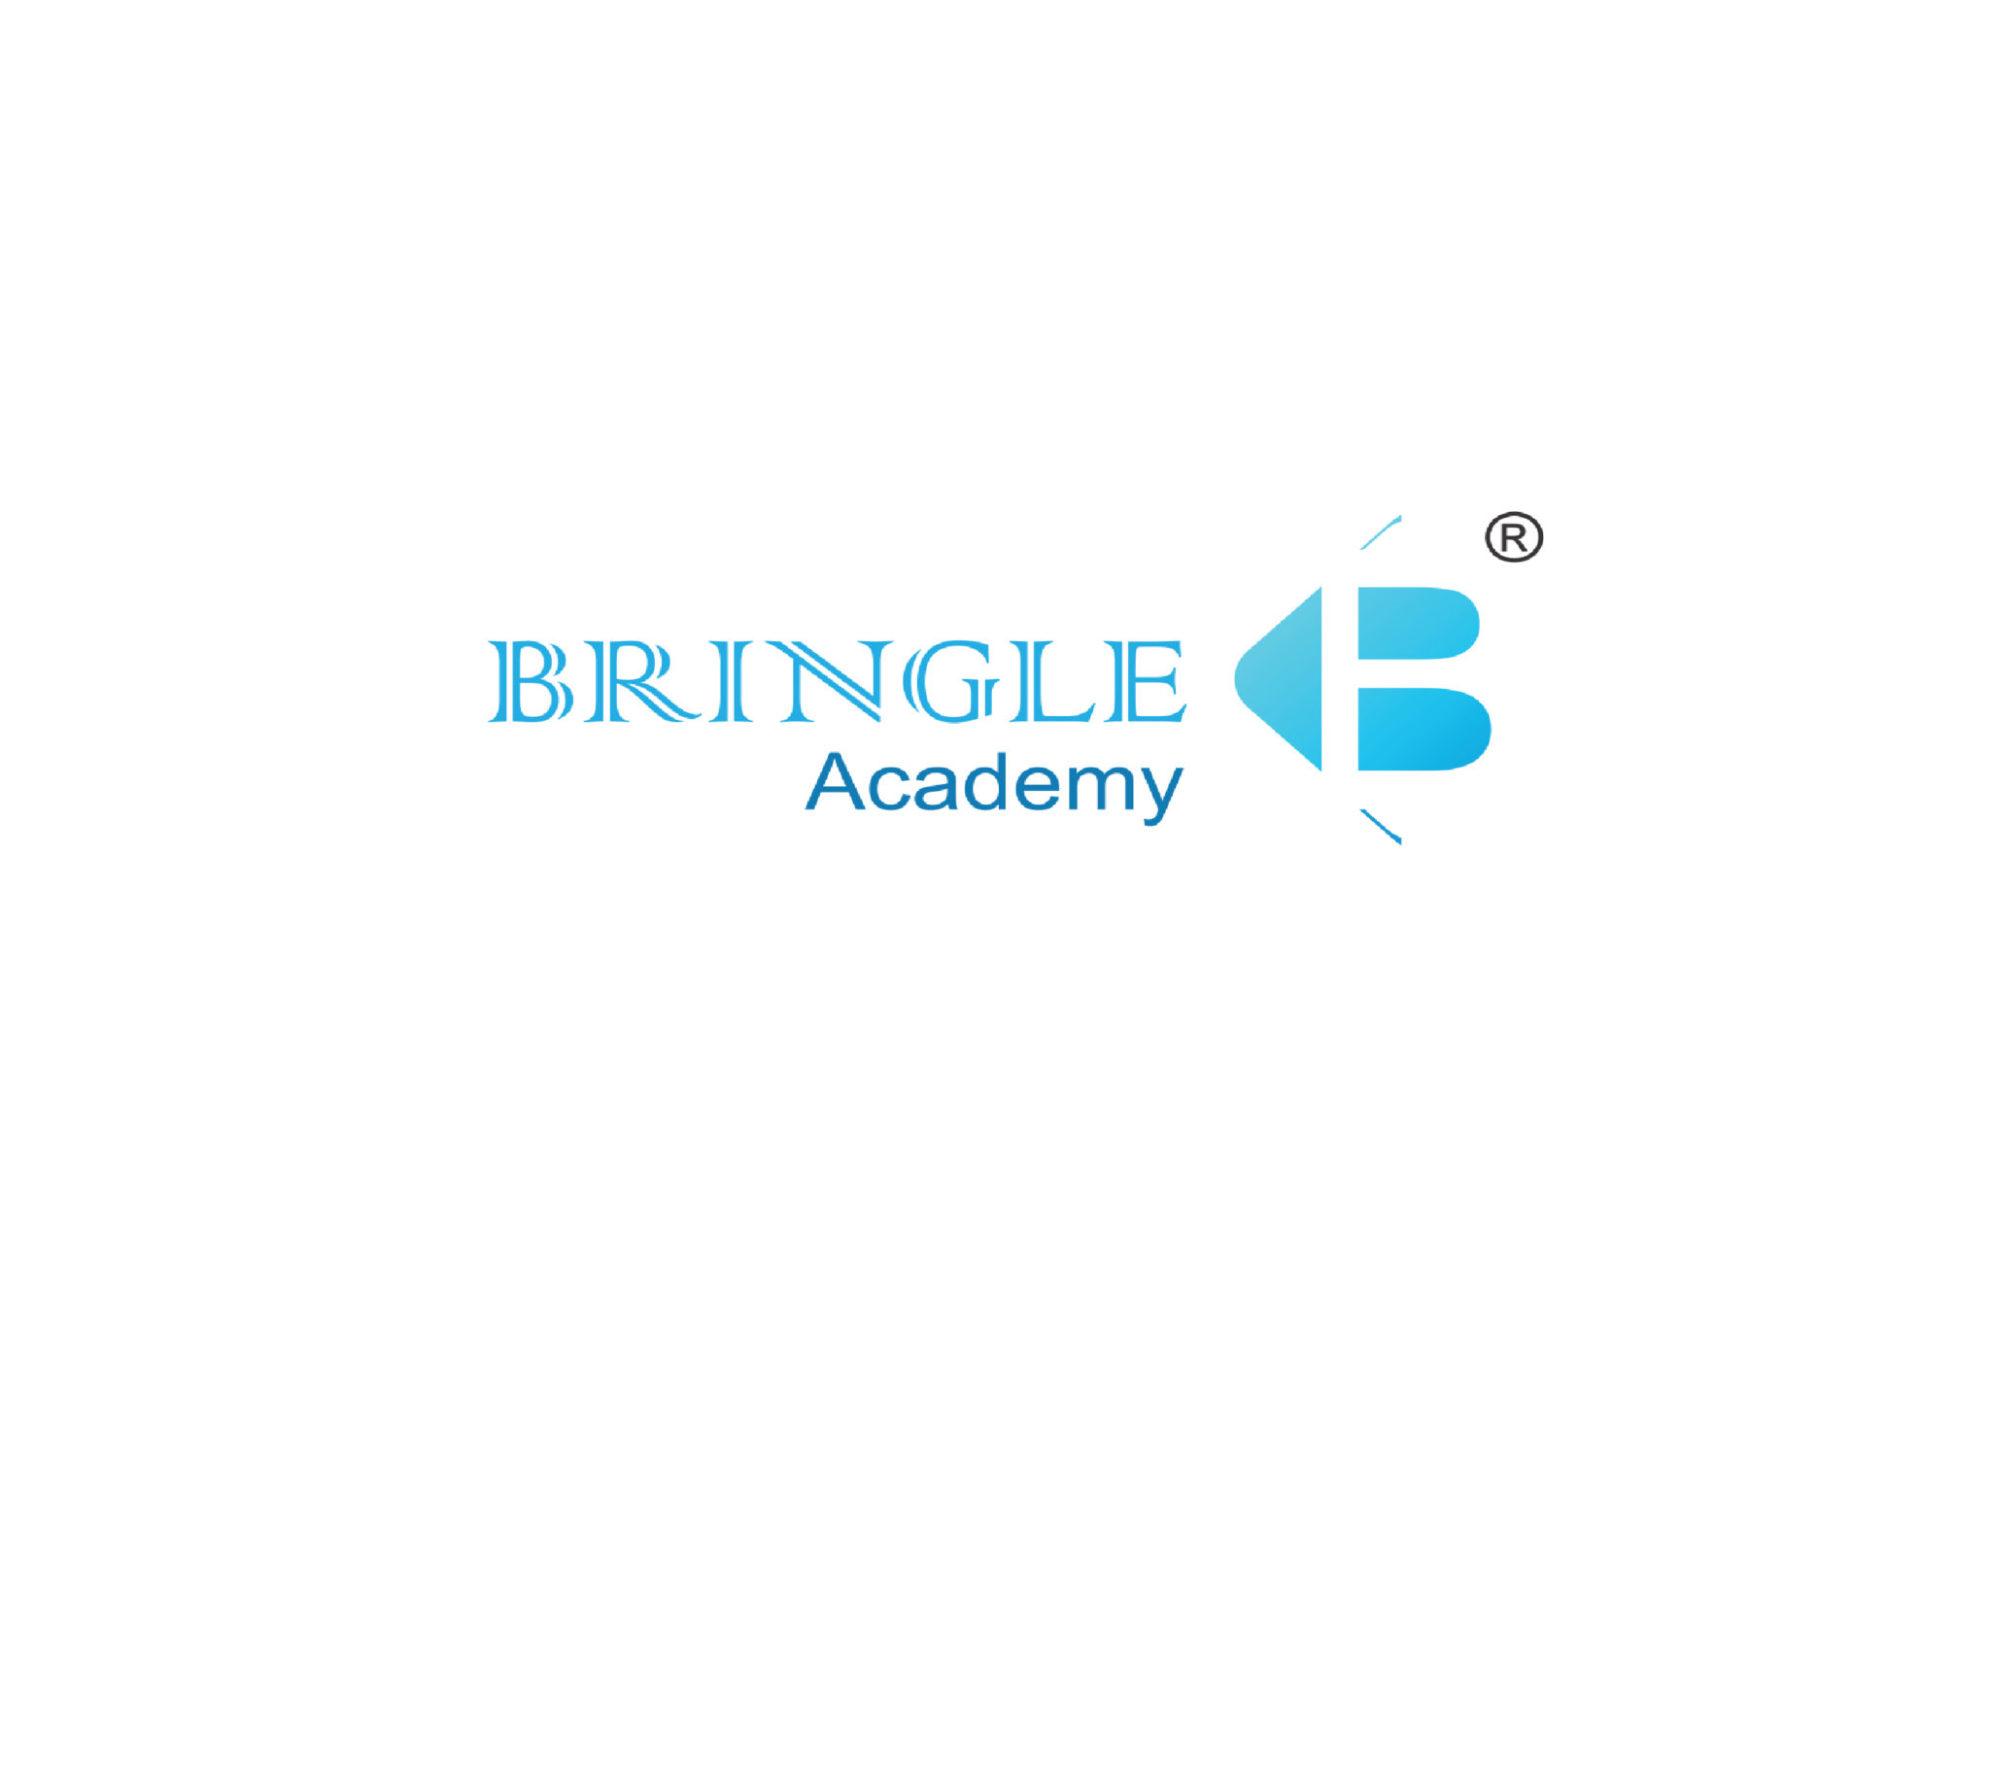 Bringle Academy